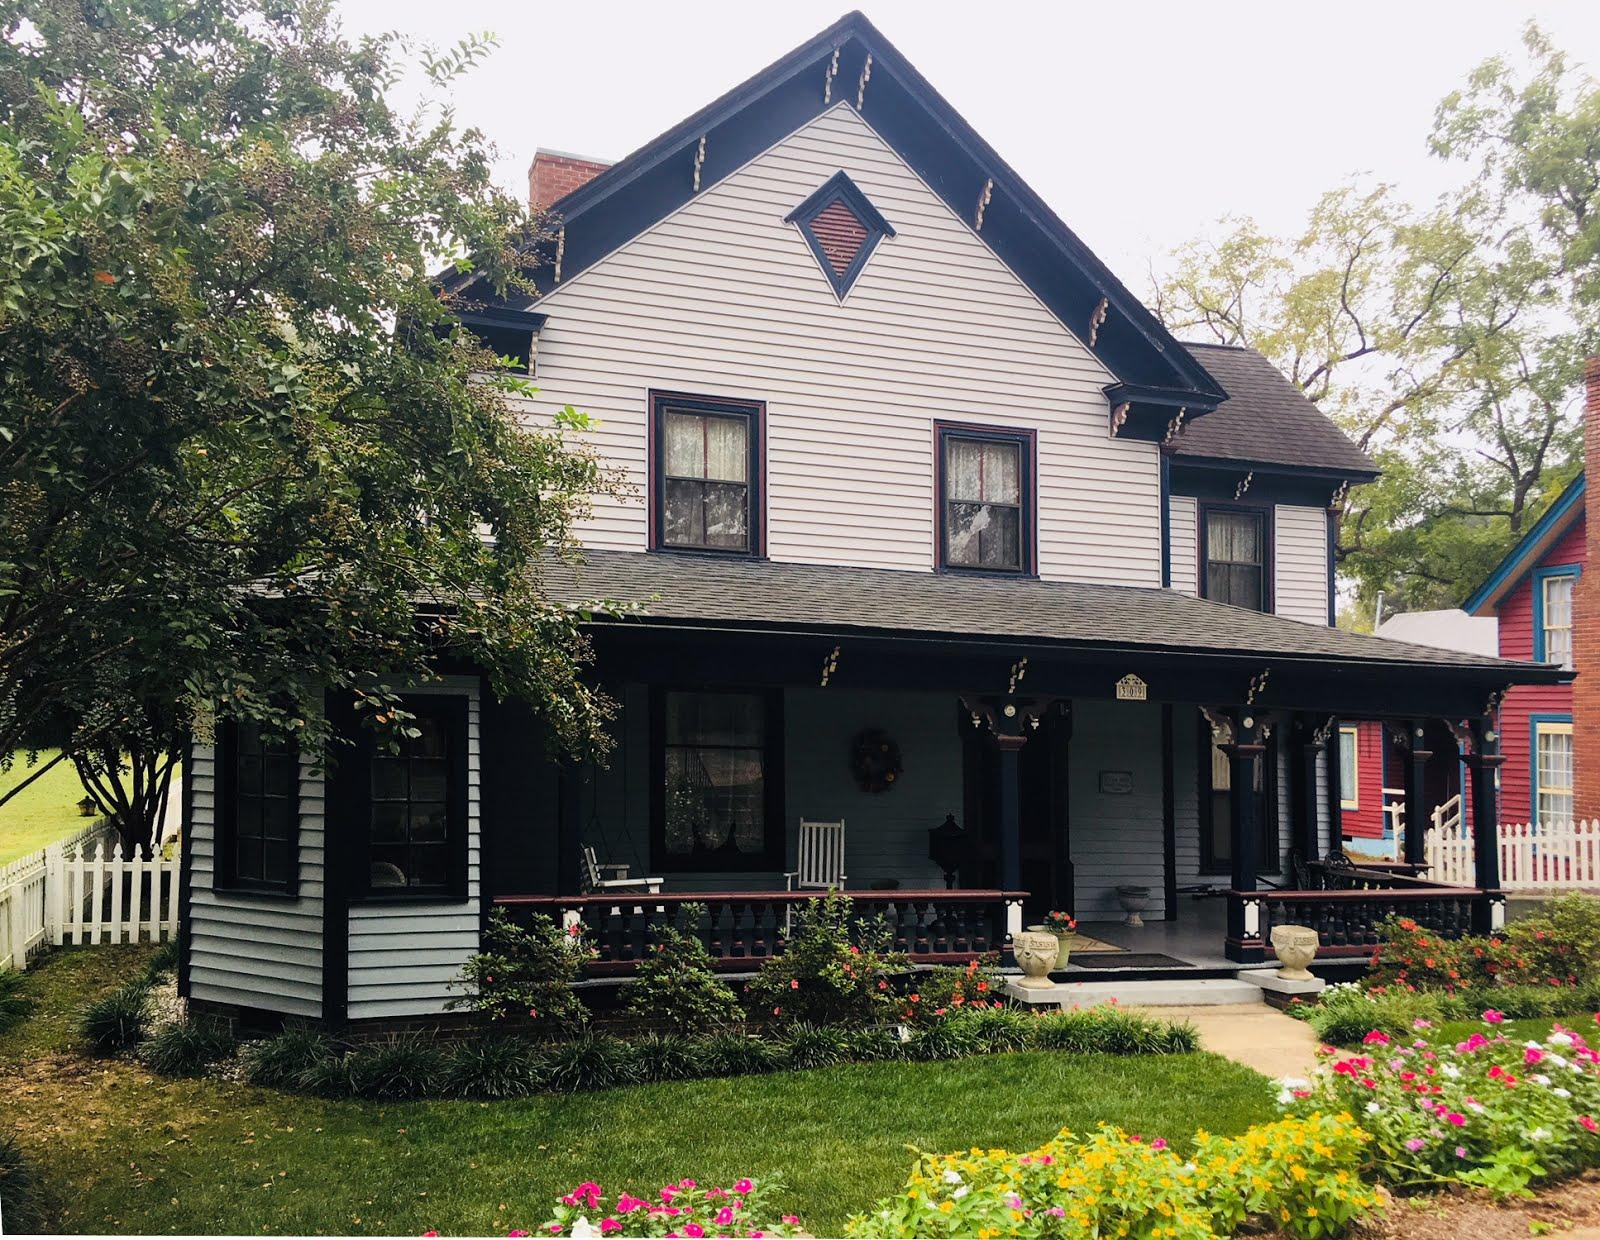 309 E. Bank Street, Salisbury NC 28144 ! circa 1885 ~ $192,900